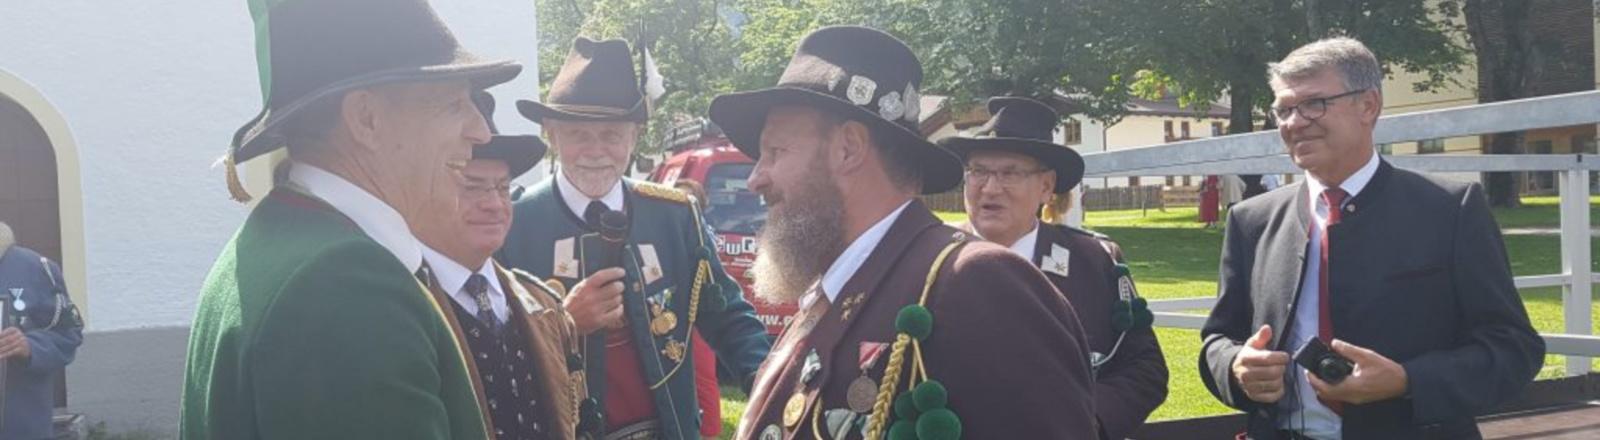 Bataillonsschützenfest Ehrwald Bild